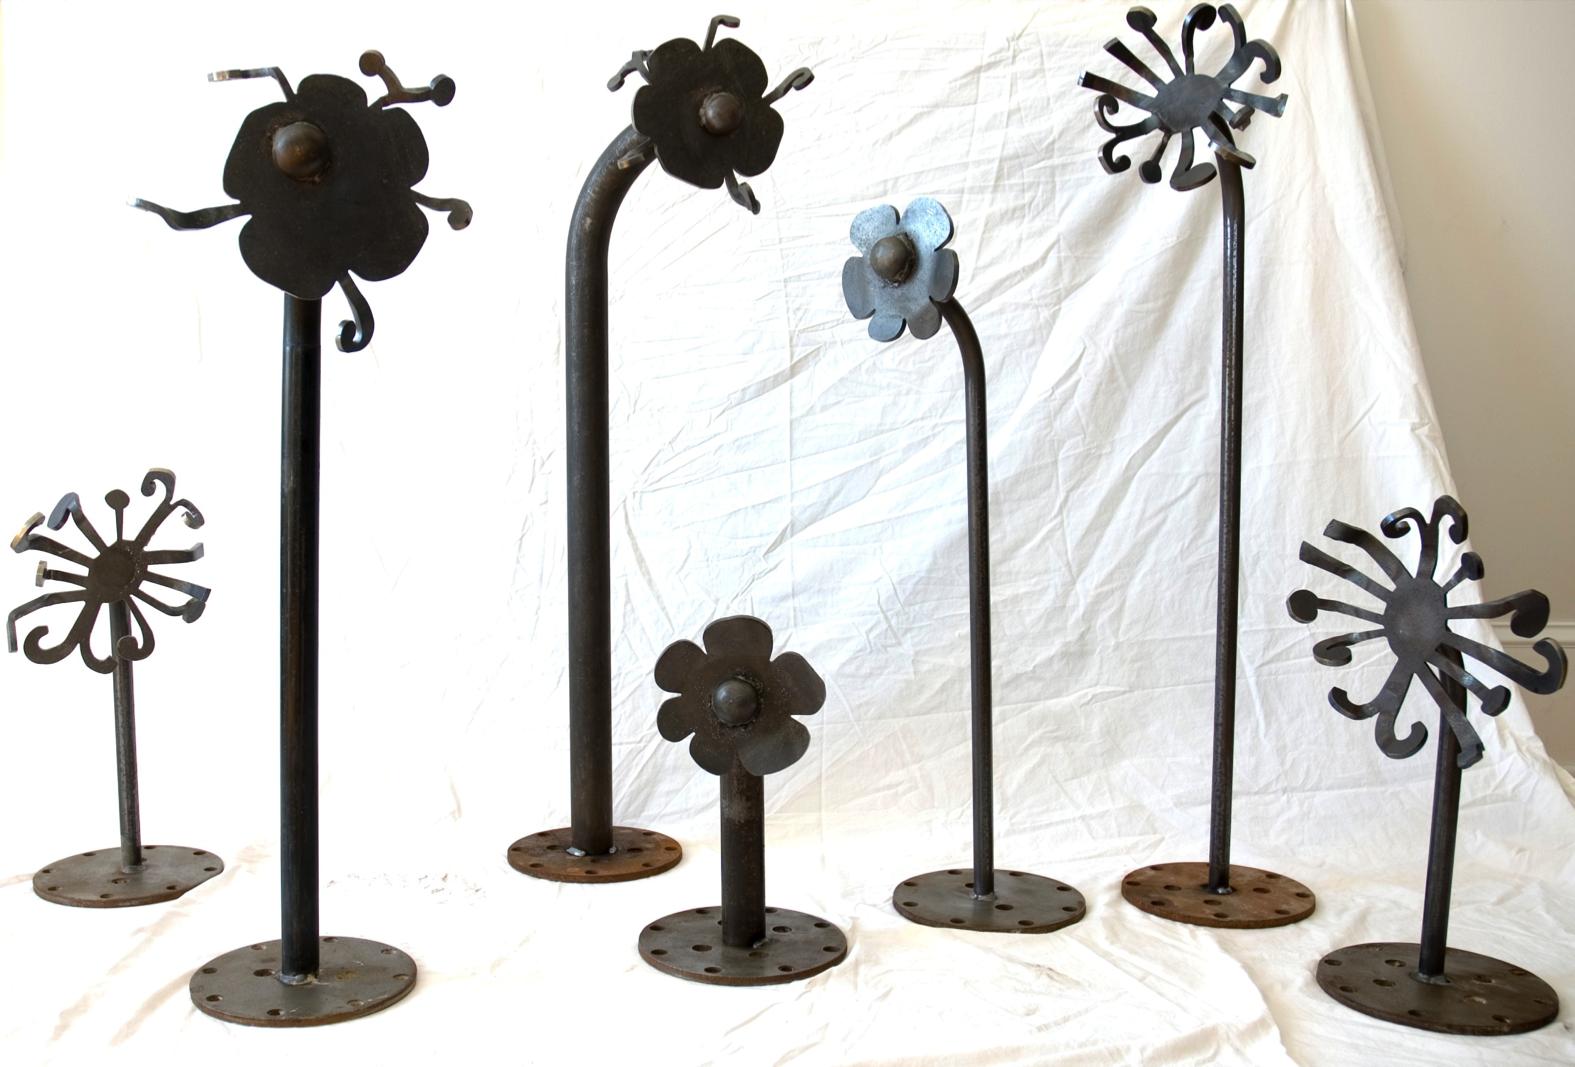 Steel Flowers, 2006